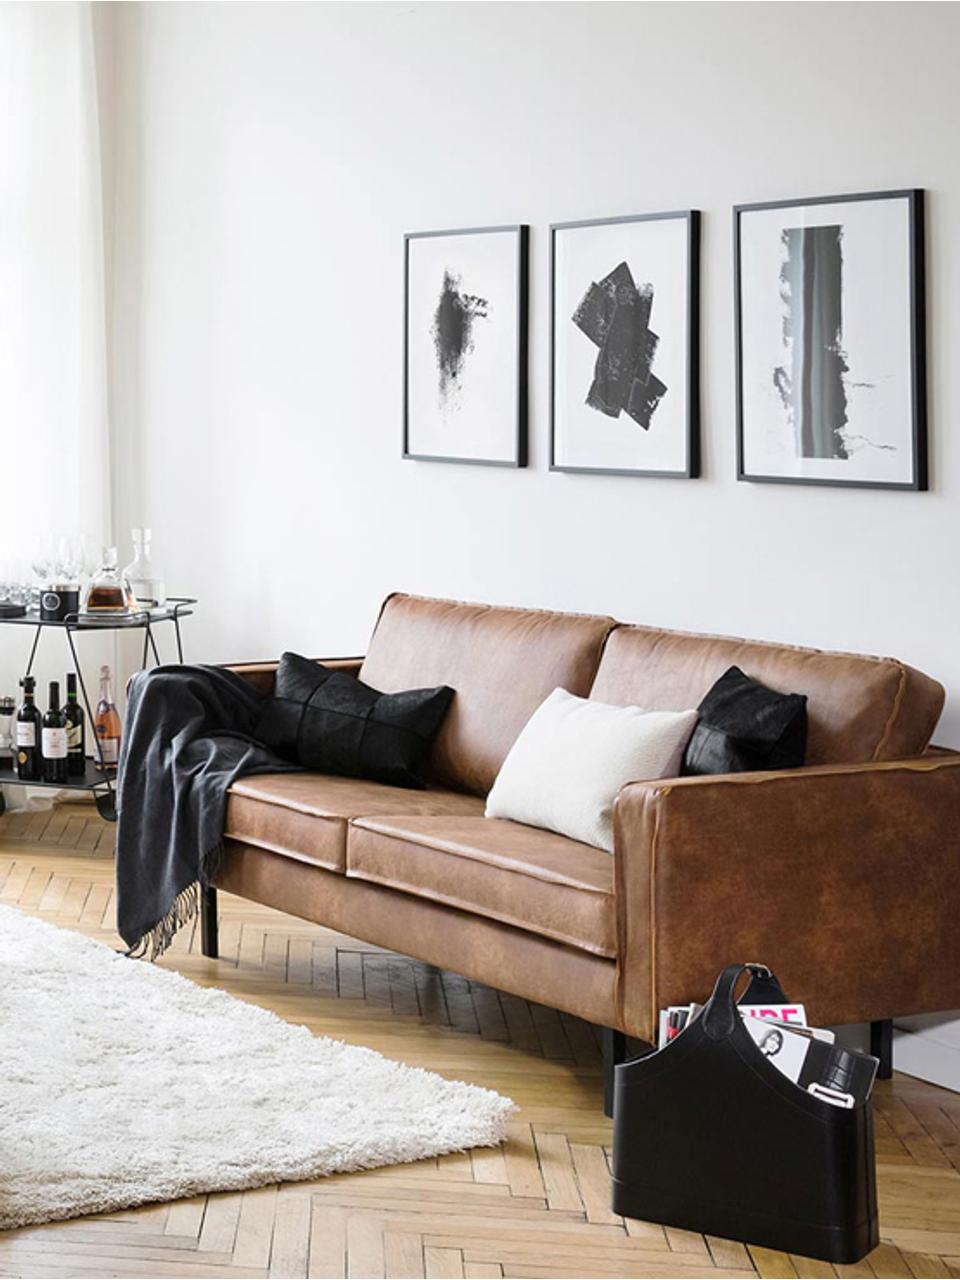 Sofa Hunter (3-Sitzer) in Braun aus recyceltem Leder, Bezug: Recyceltes Leder (70% Led, Gestell: Massives Birkenholz und h, Füße: Metall, pulverbeschichtet, Leder Braun, B 219 x T 90 cm